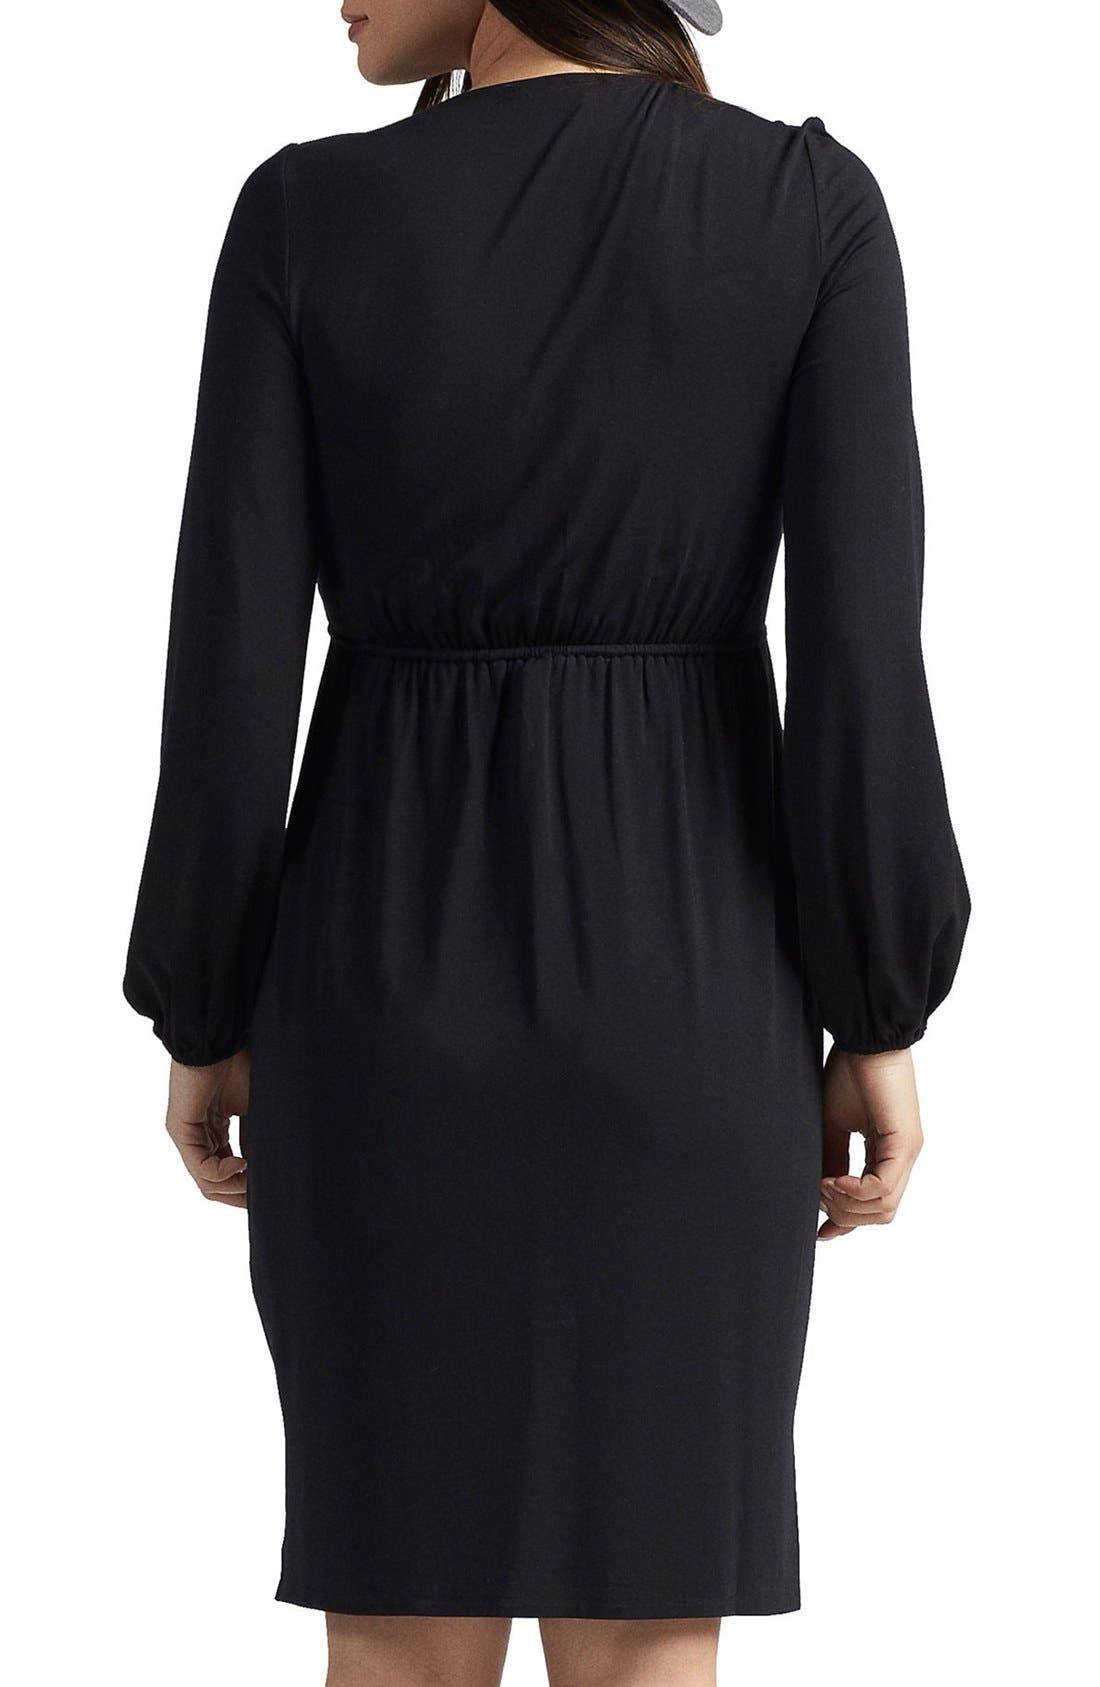 Mellany Maternity Dress,                             Alternate thumbnail 2, color,                             BLACK